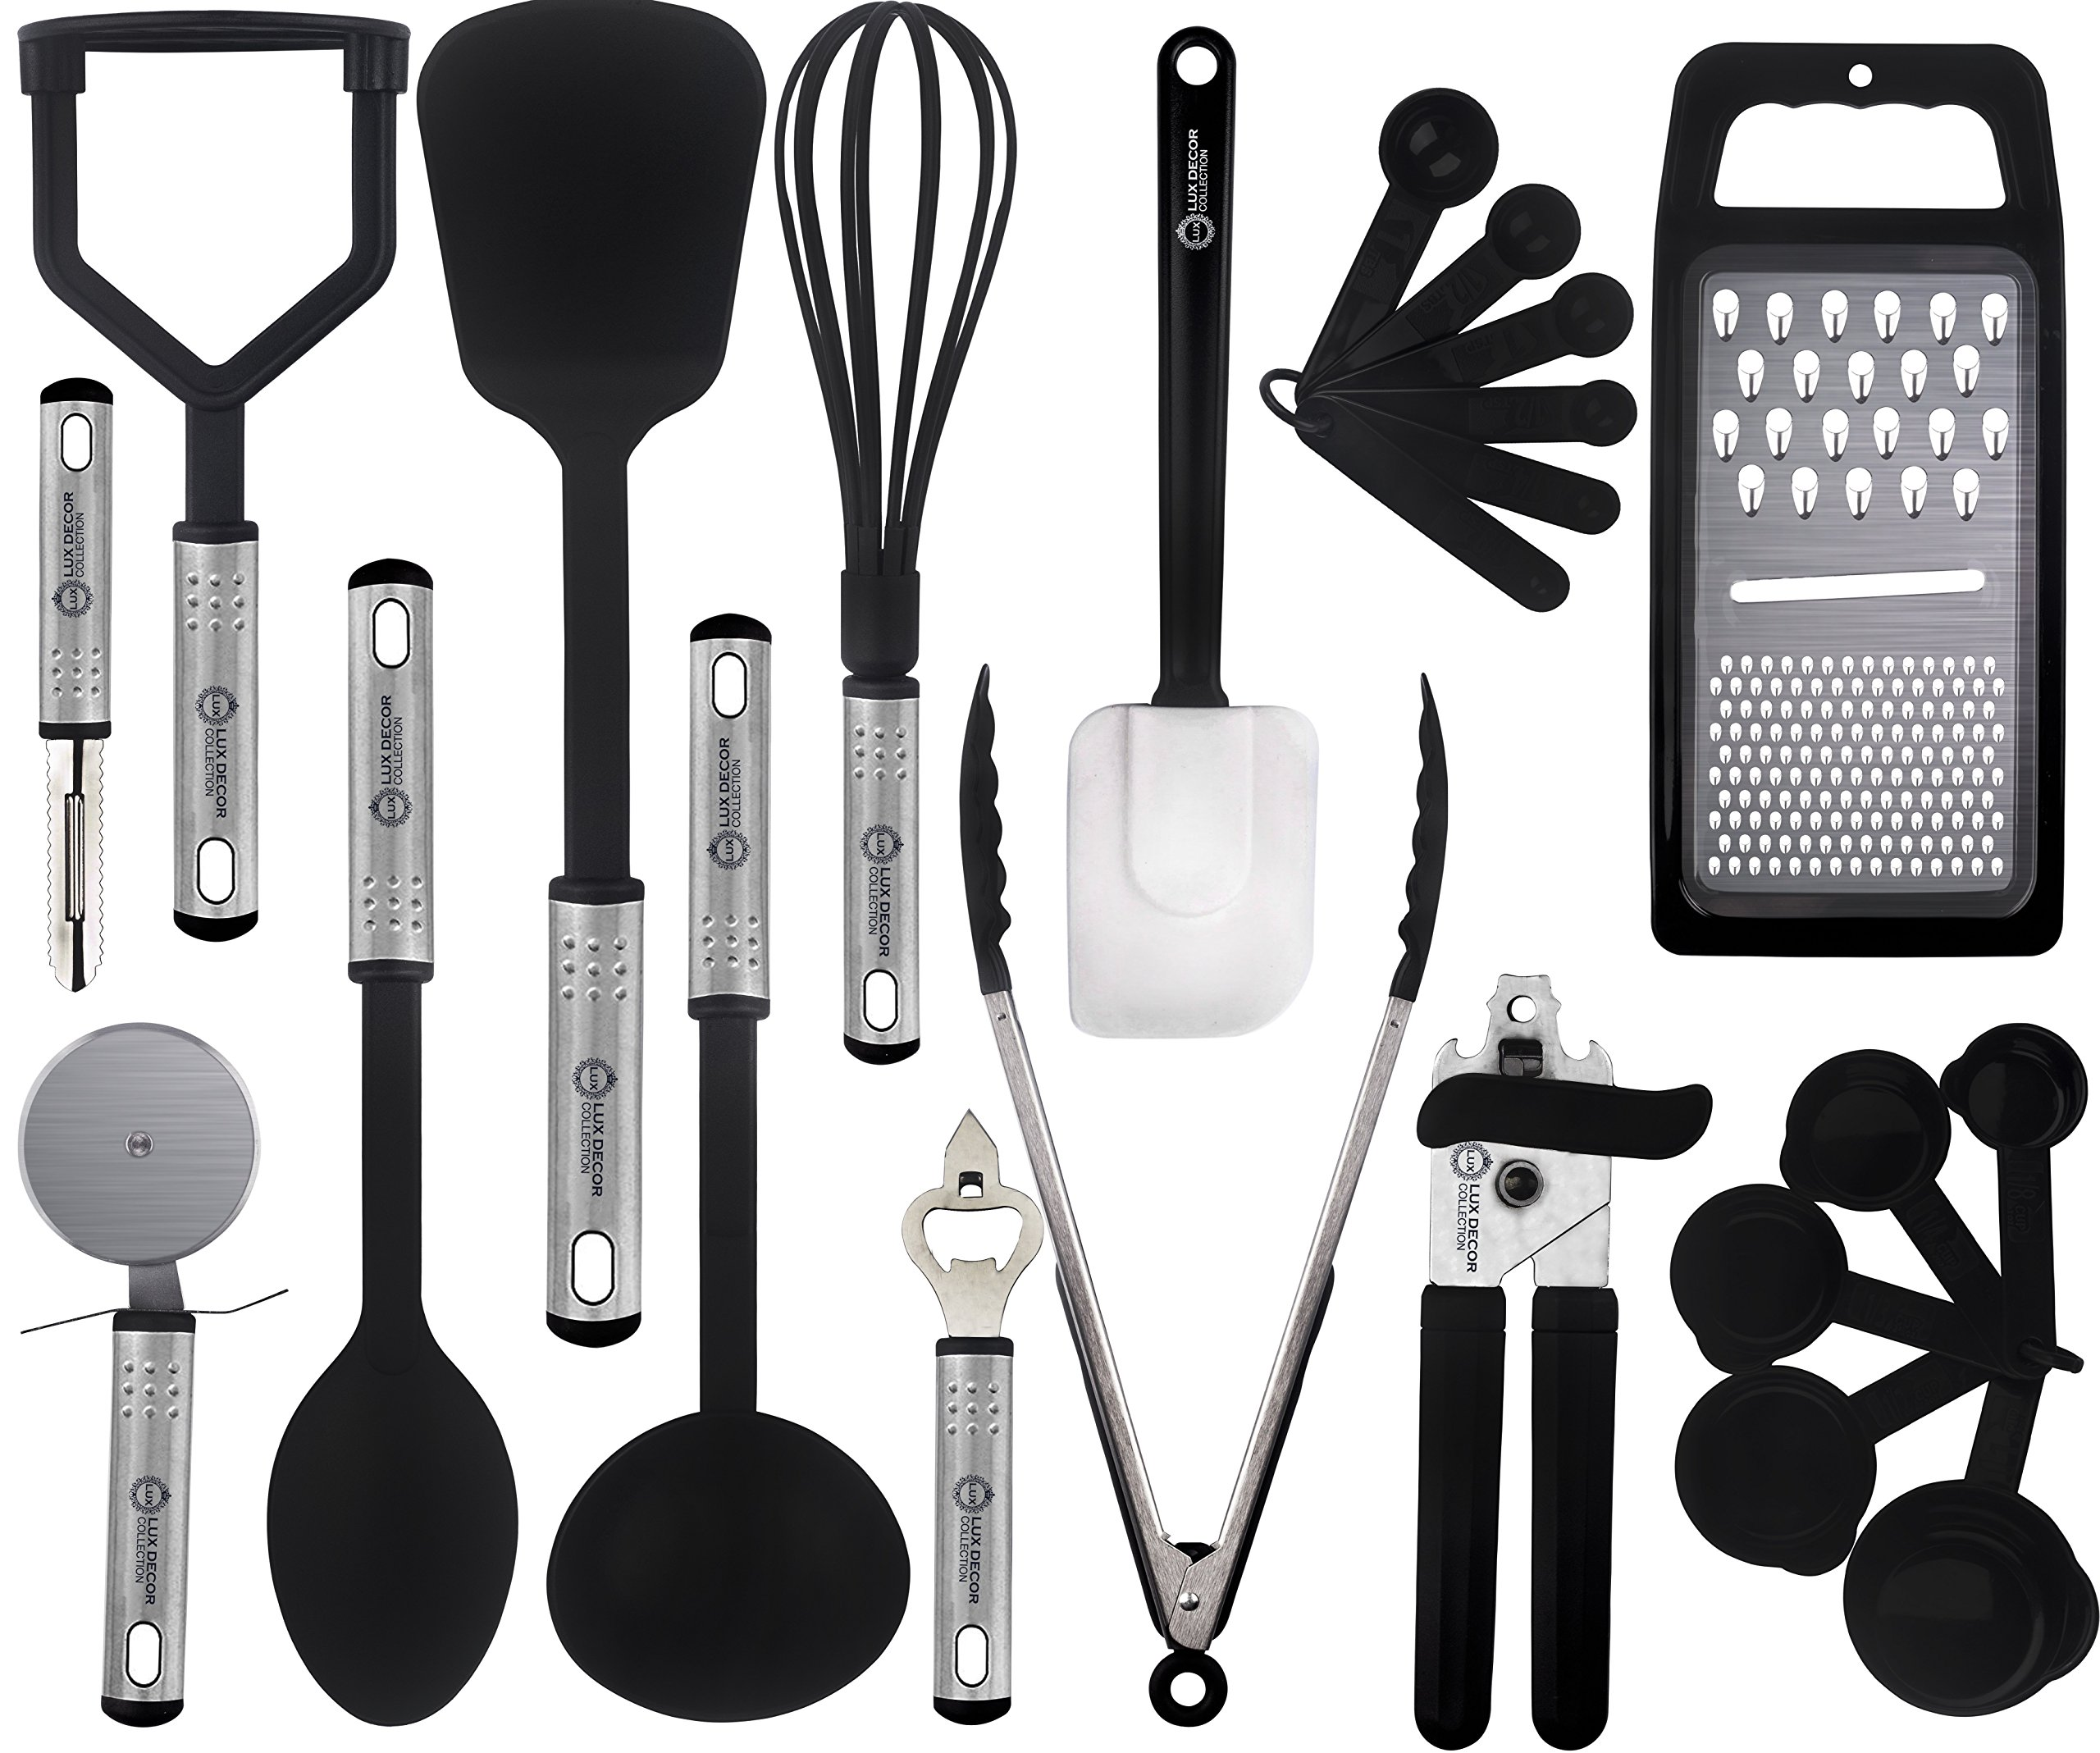 Cooking Utensils Set – 23 Pieces – Nylon Kitchen Utensils/Gadgets / Cookware Sets – By Lux Décor Collection